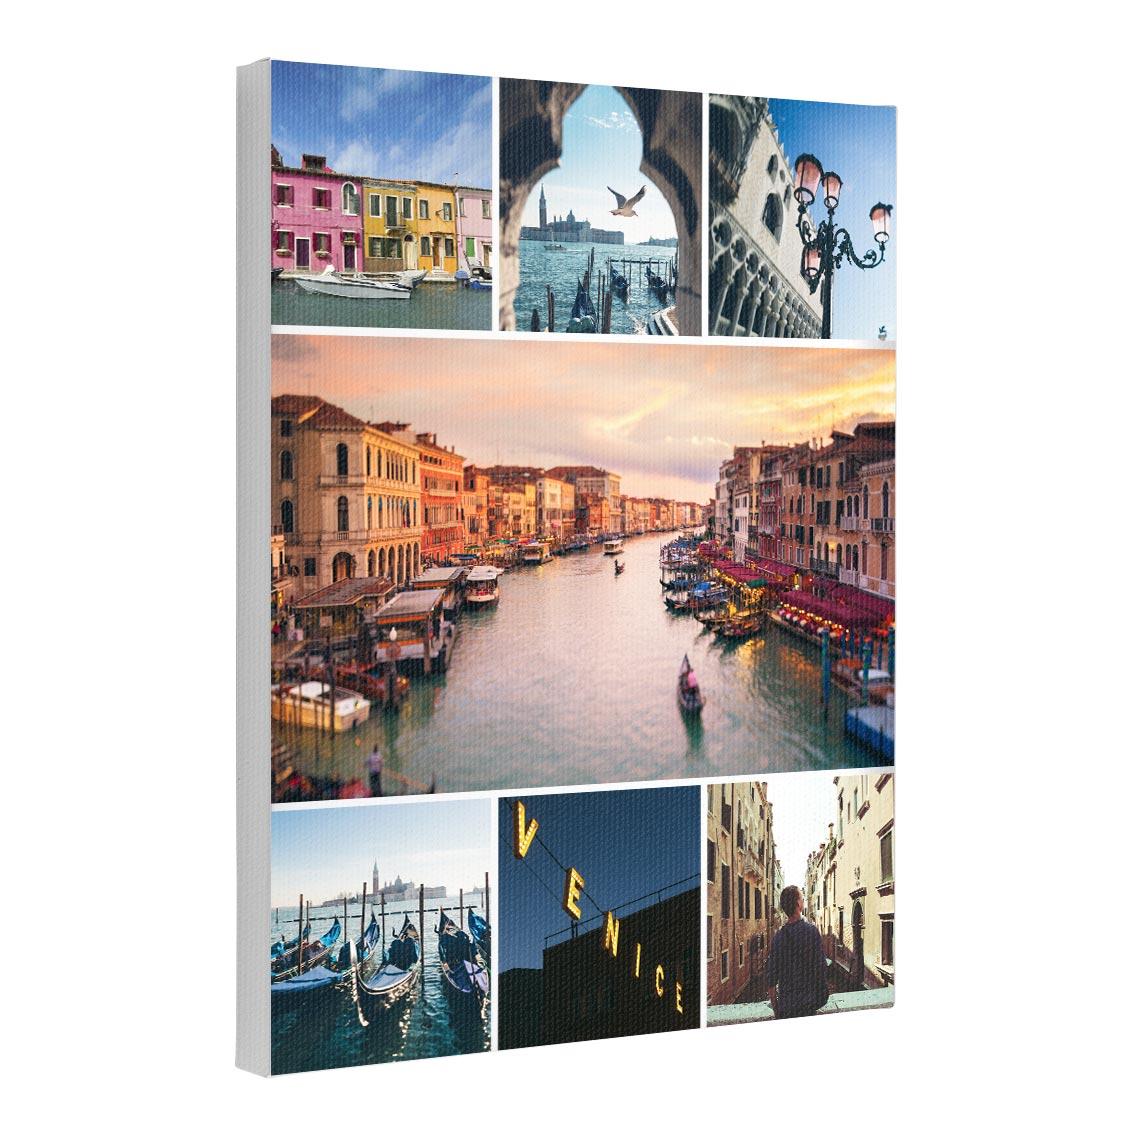 30x45cm 12x18 collage canvas collage canvas canvas home